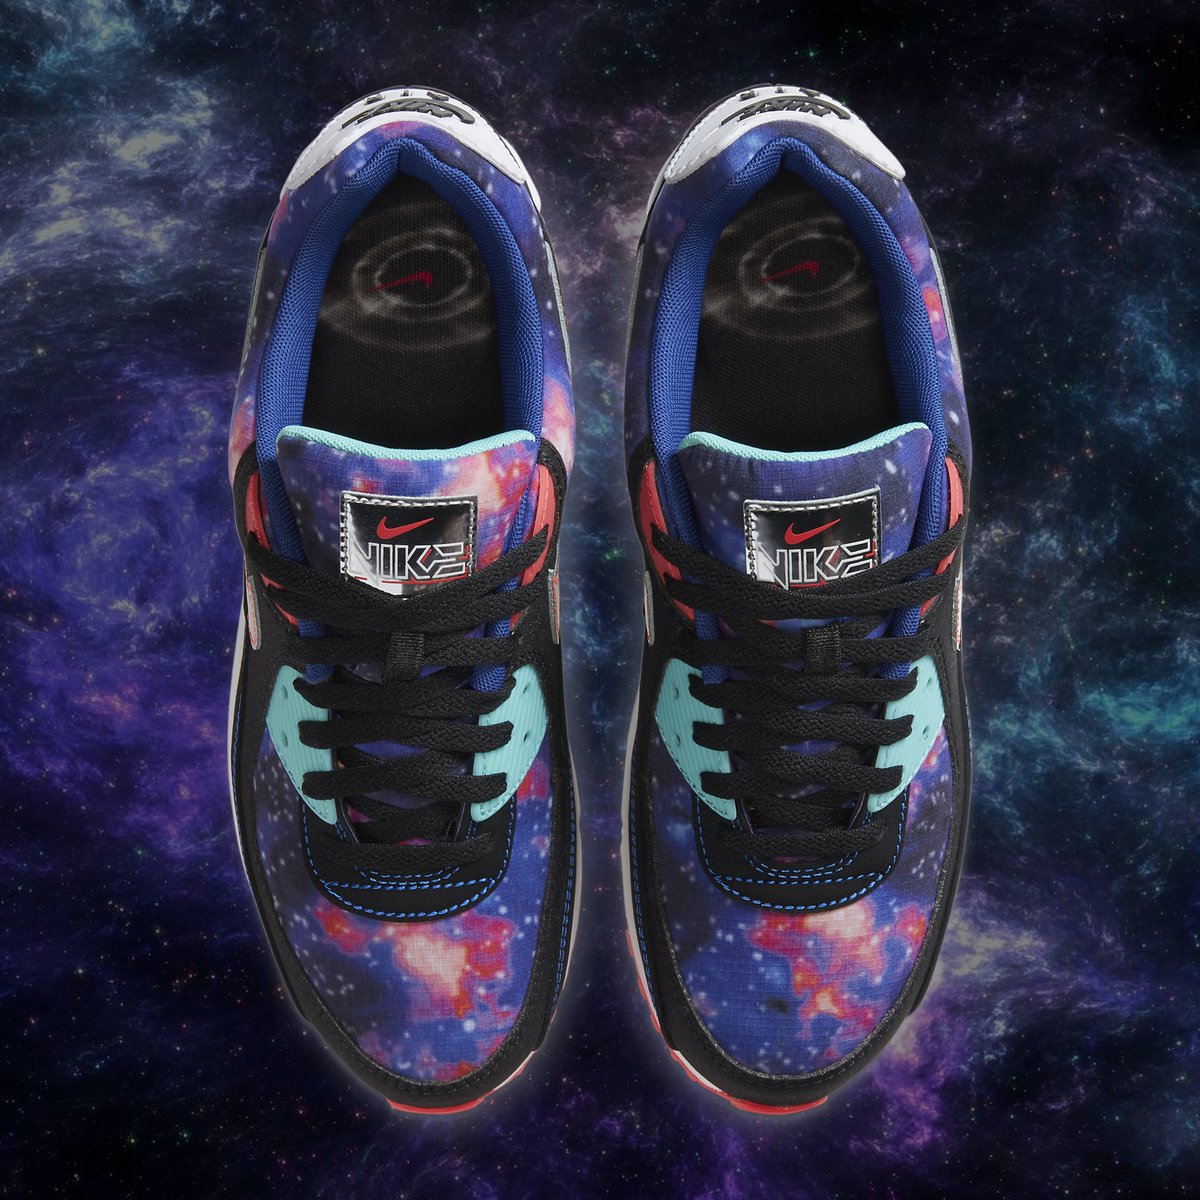 J23 Iphone App On Twitter Nike Air Max 90 Supernova June 20th